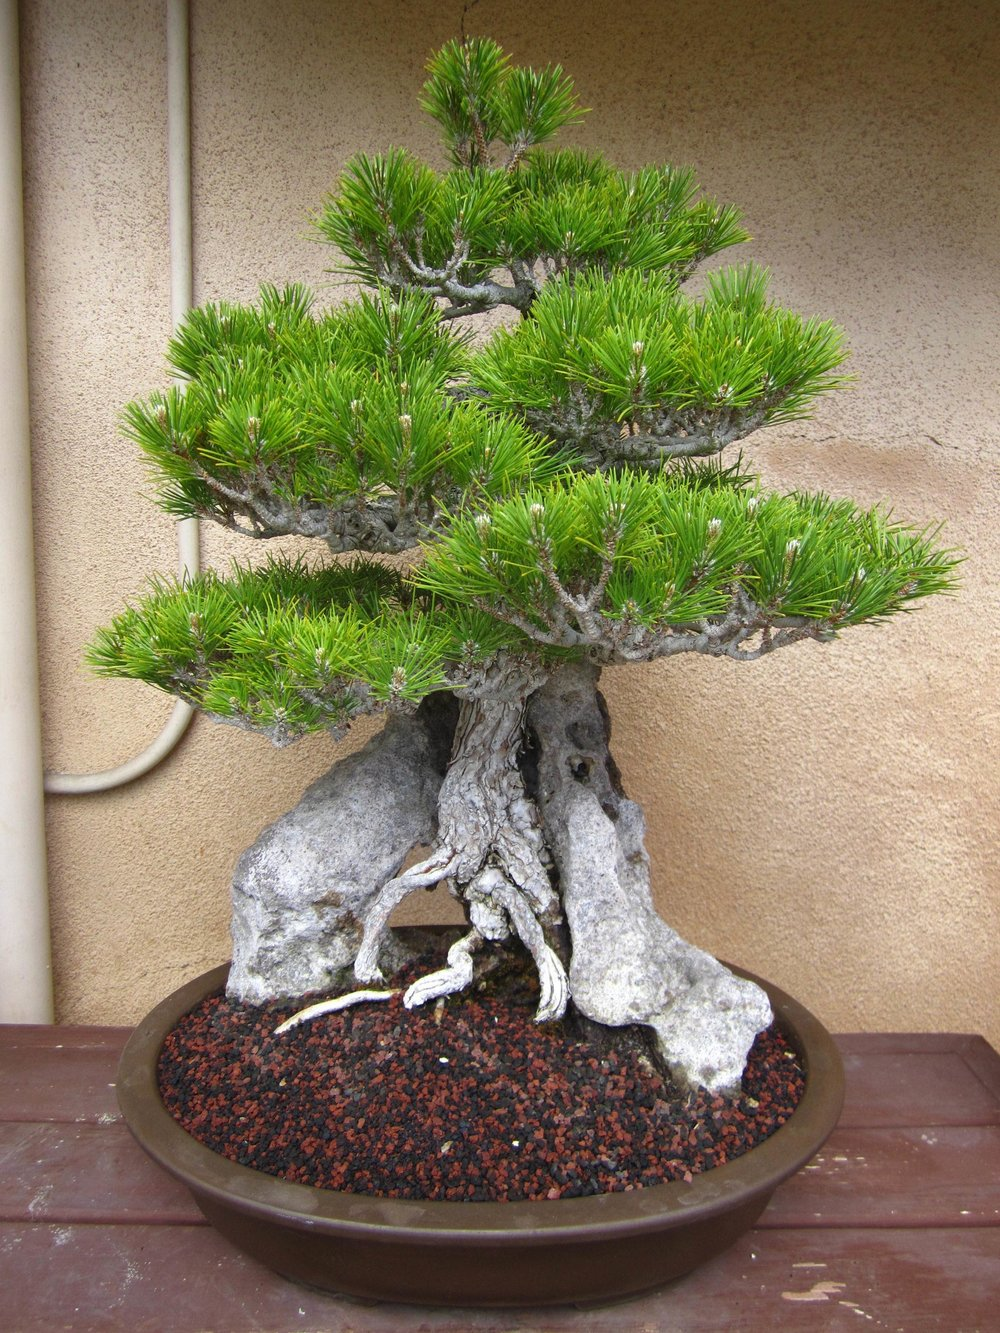 2. Japanese Black Pine